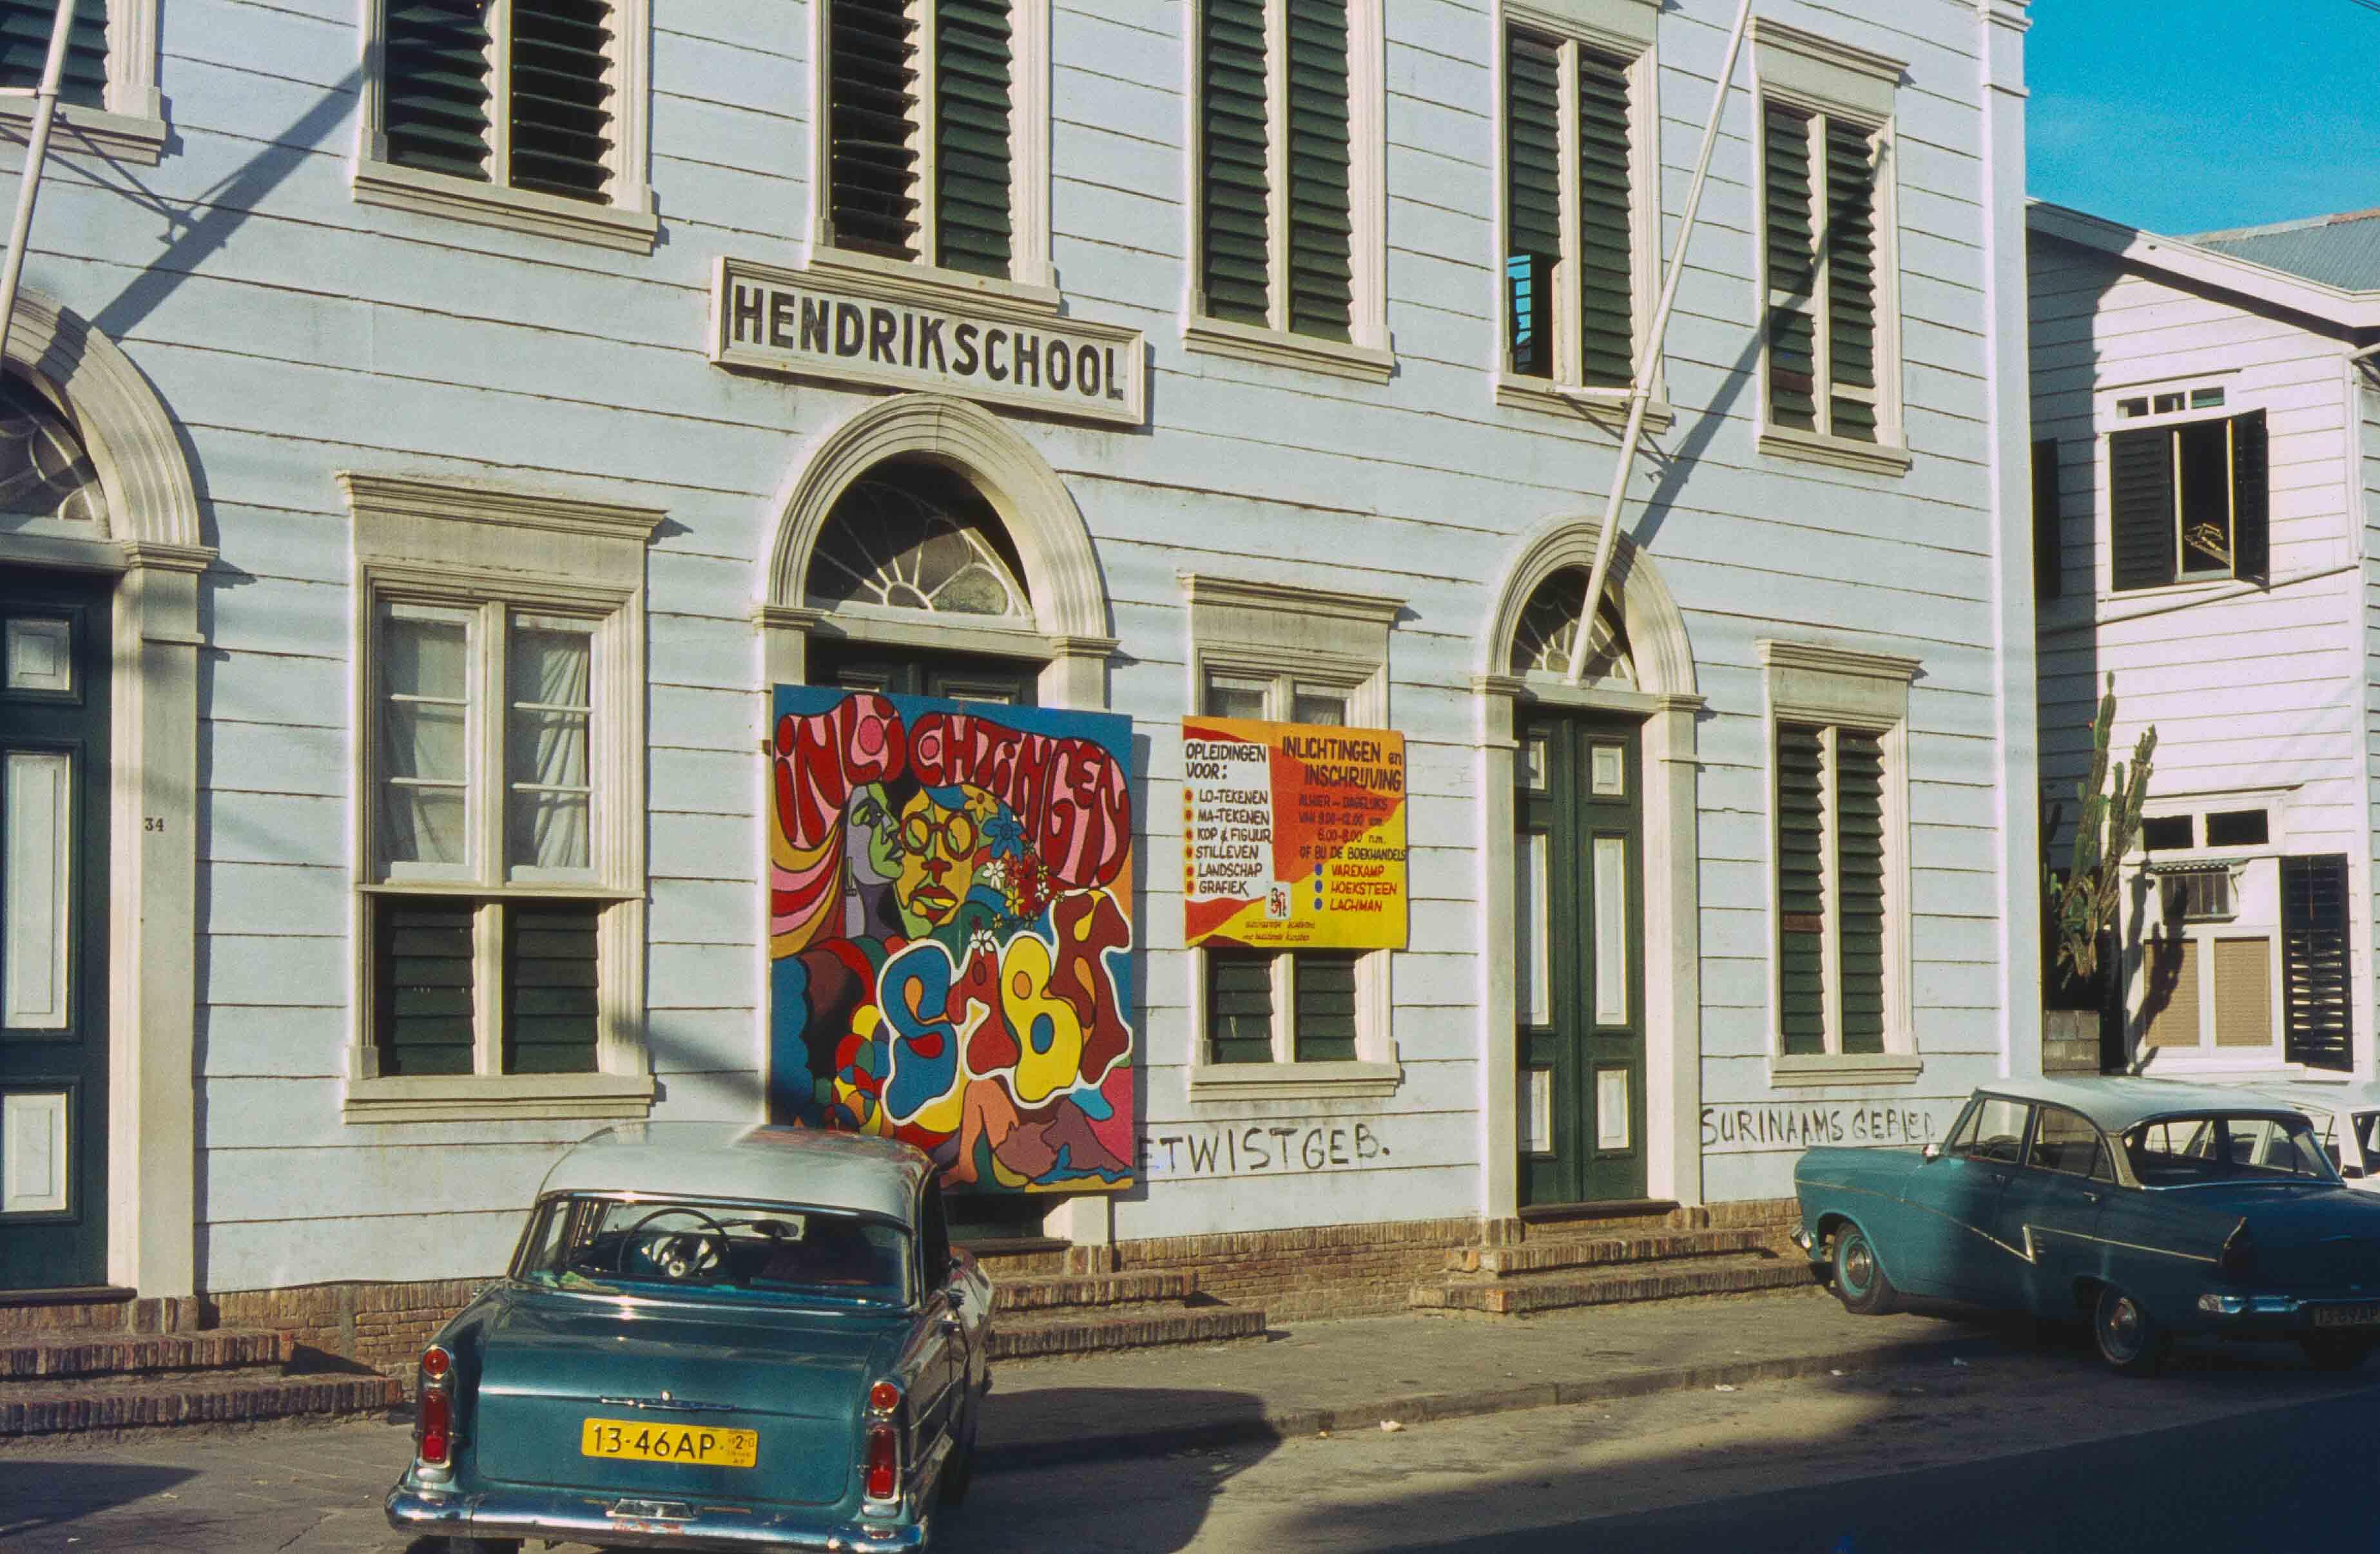 155. Suriname